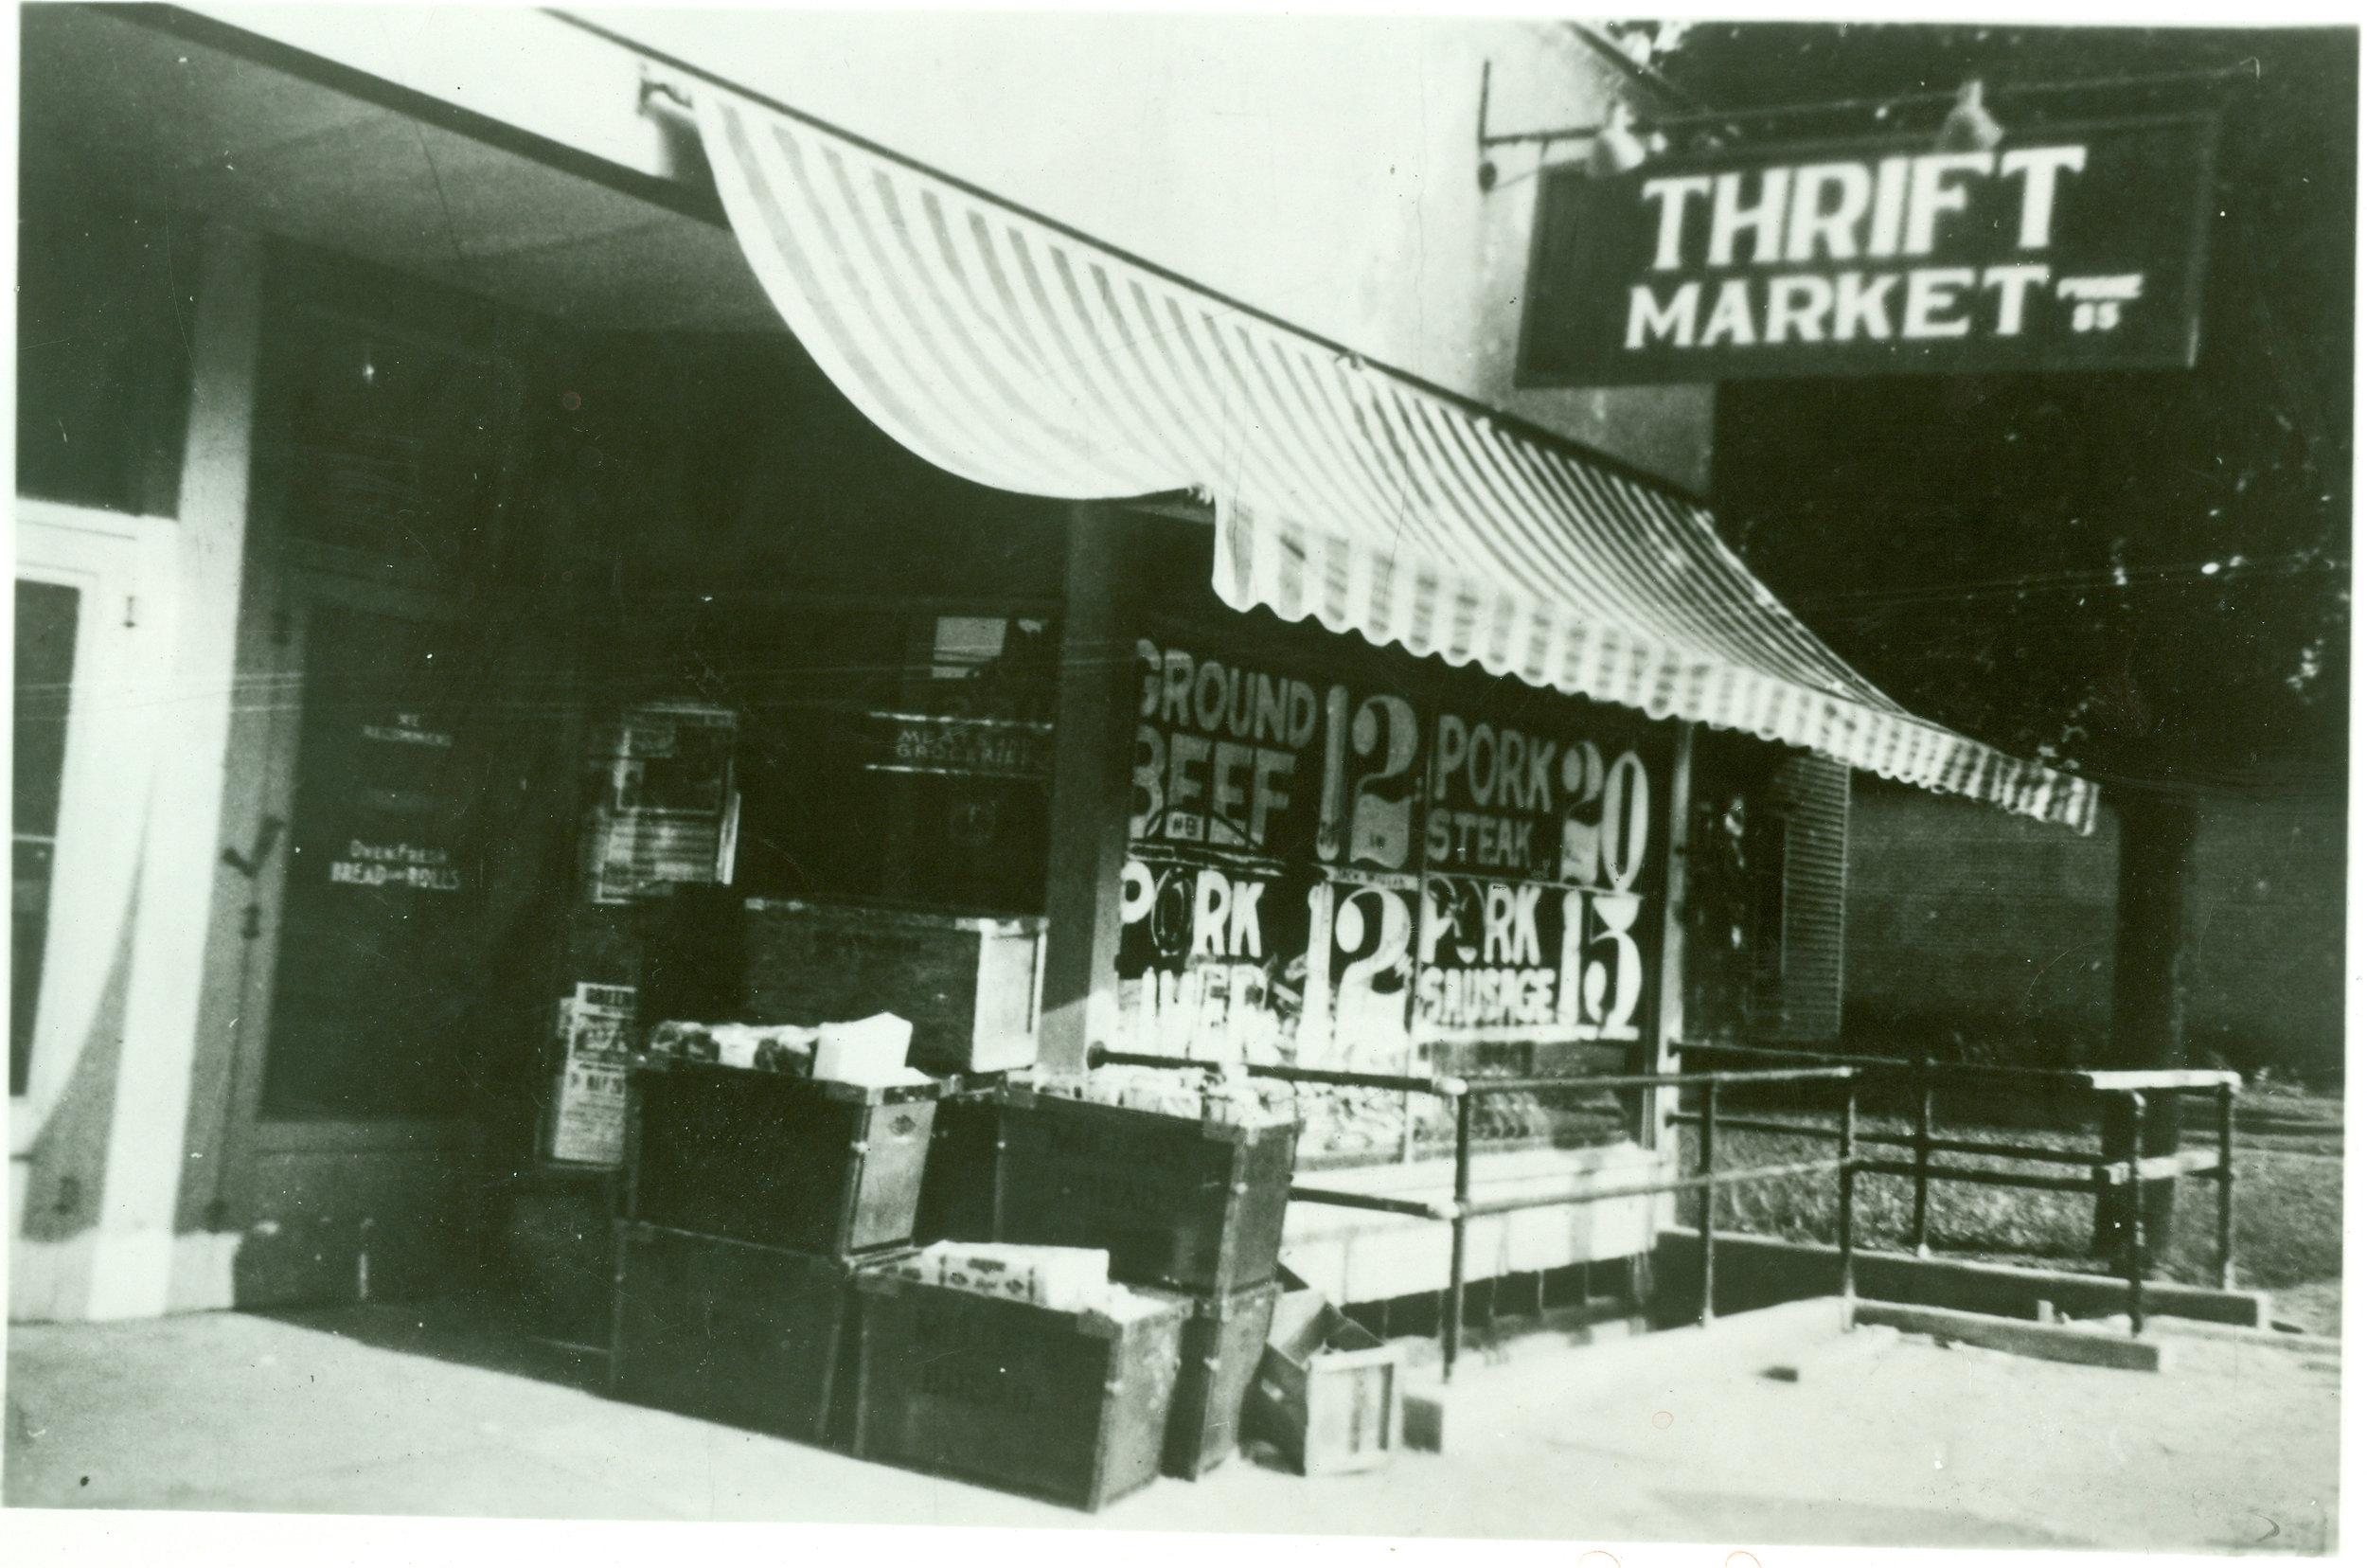 Store001_1937 copy.jpg